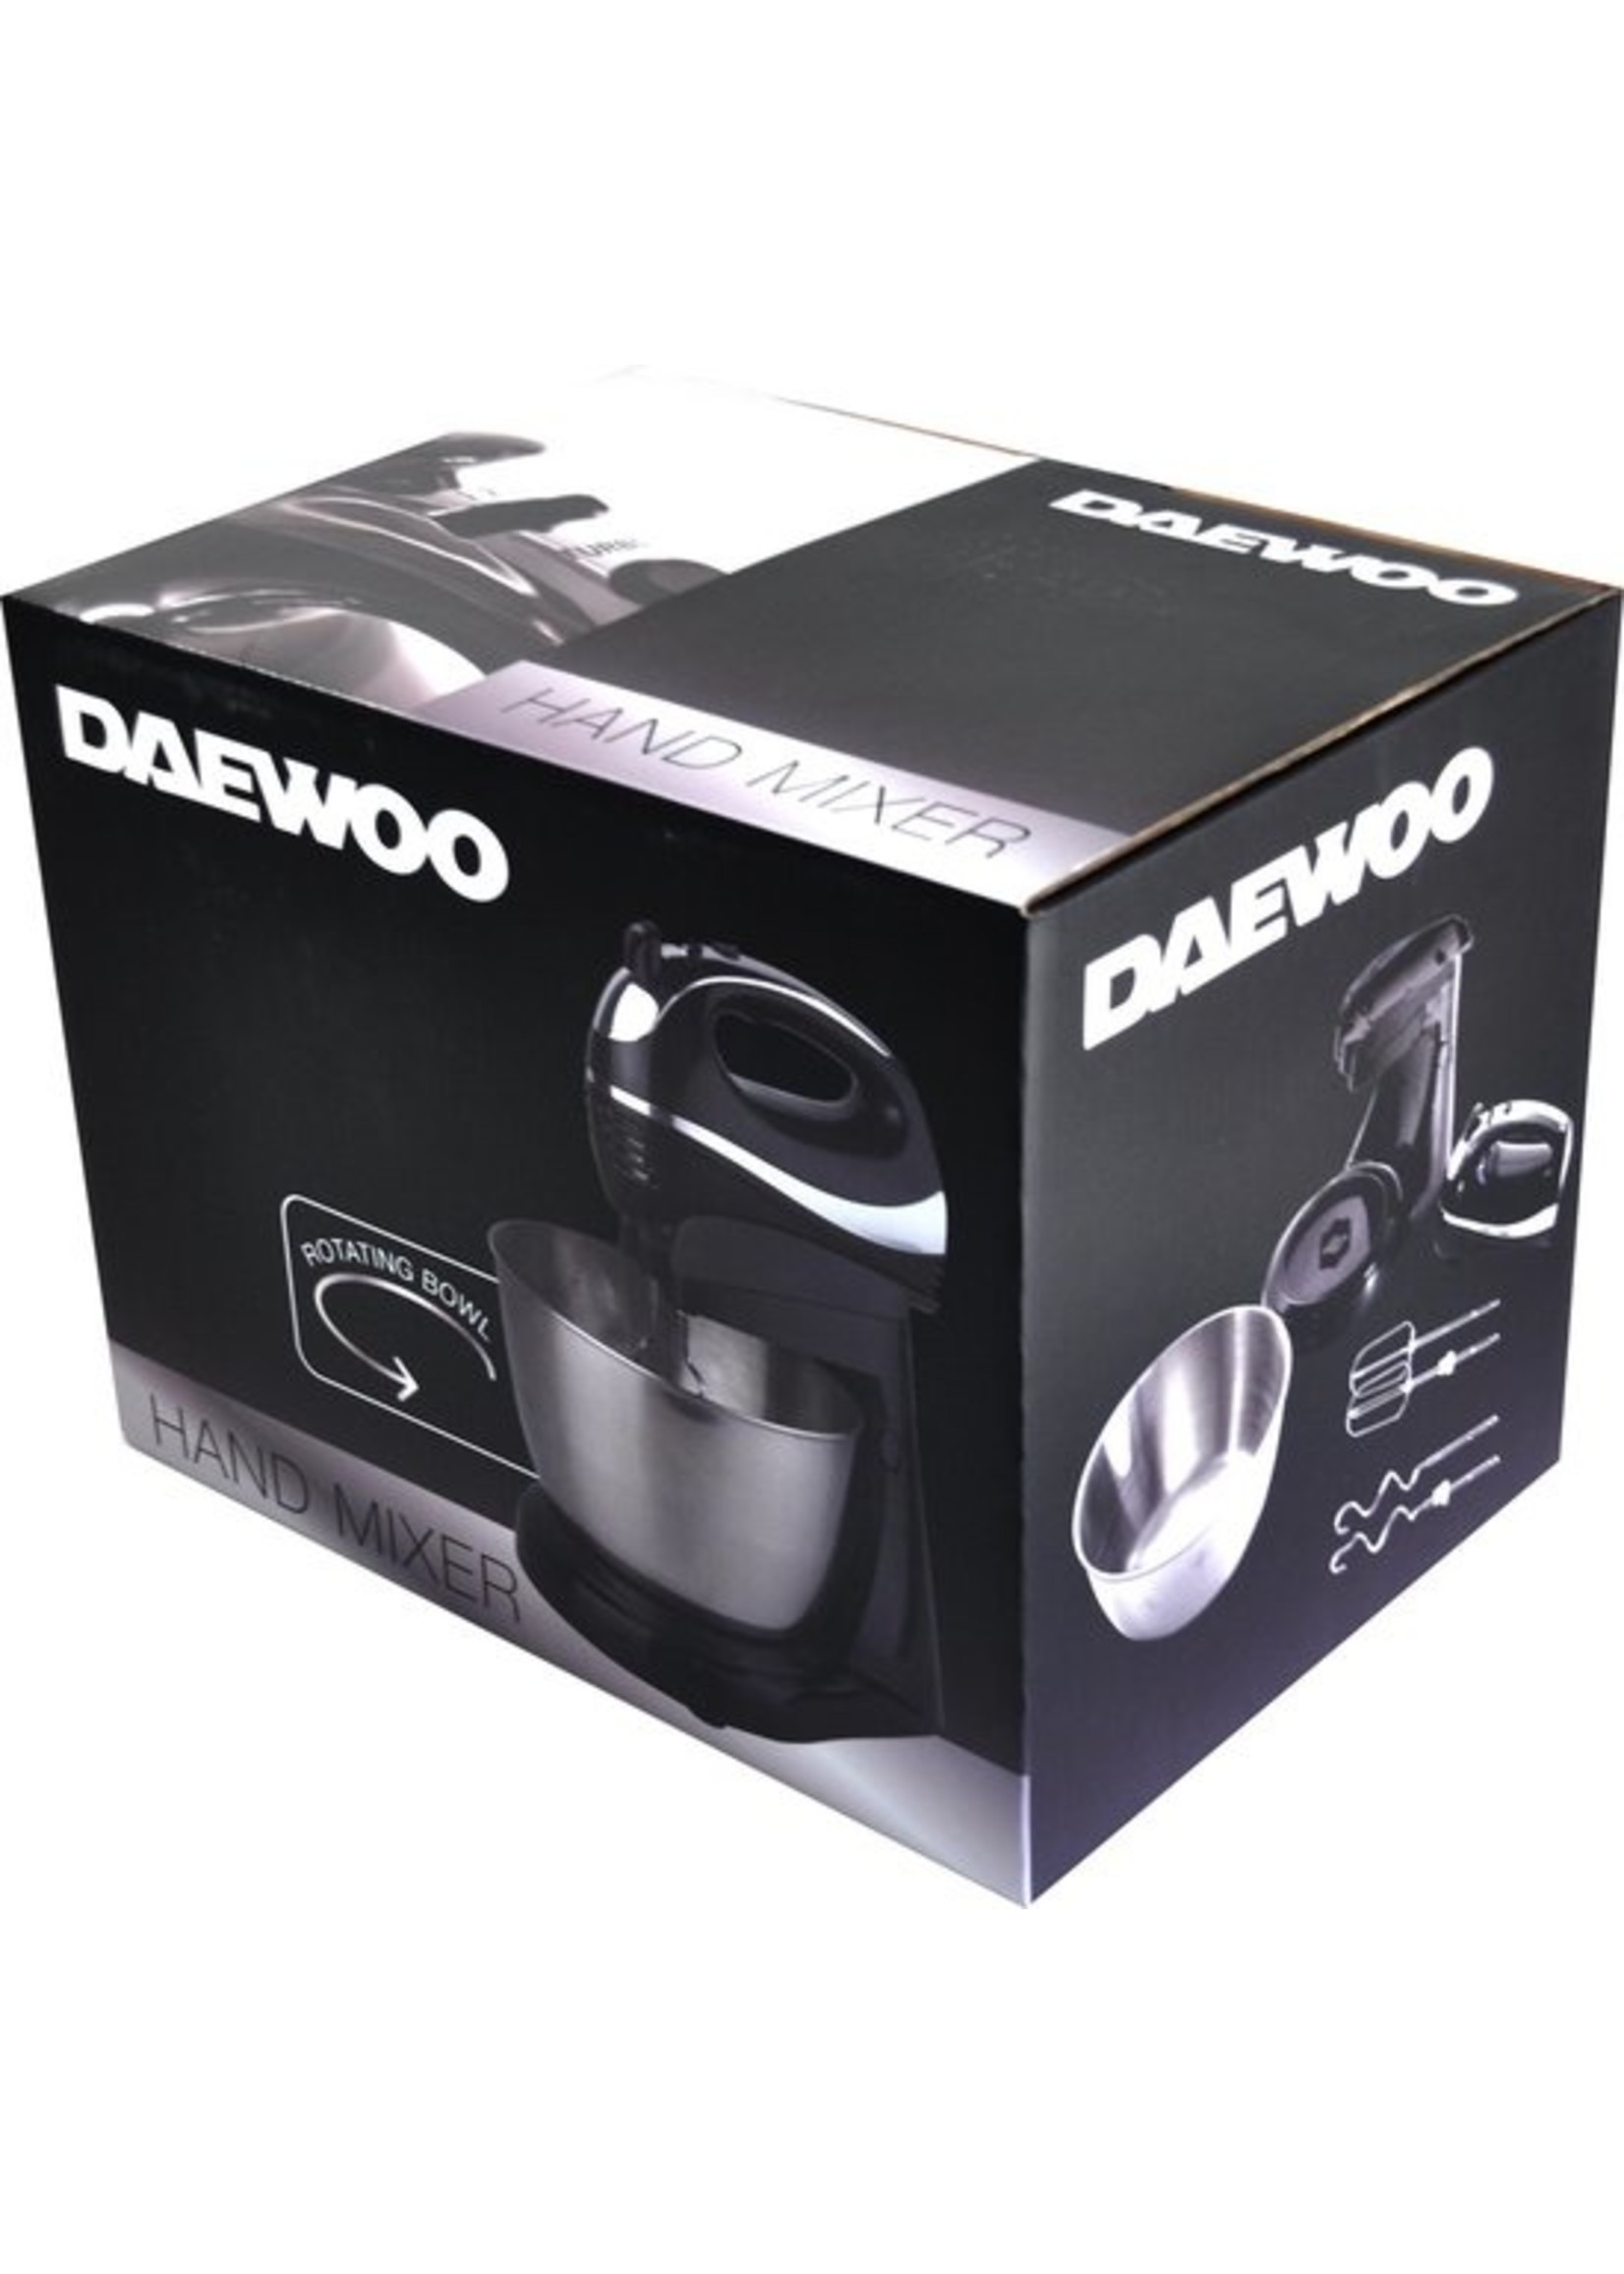 Daewoo DAEWOO  - Handmixer met kom